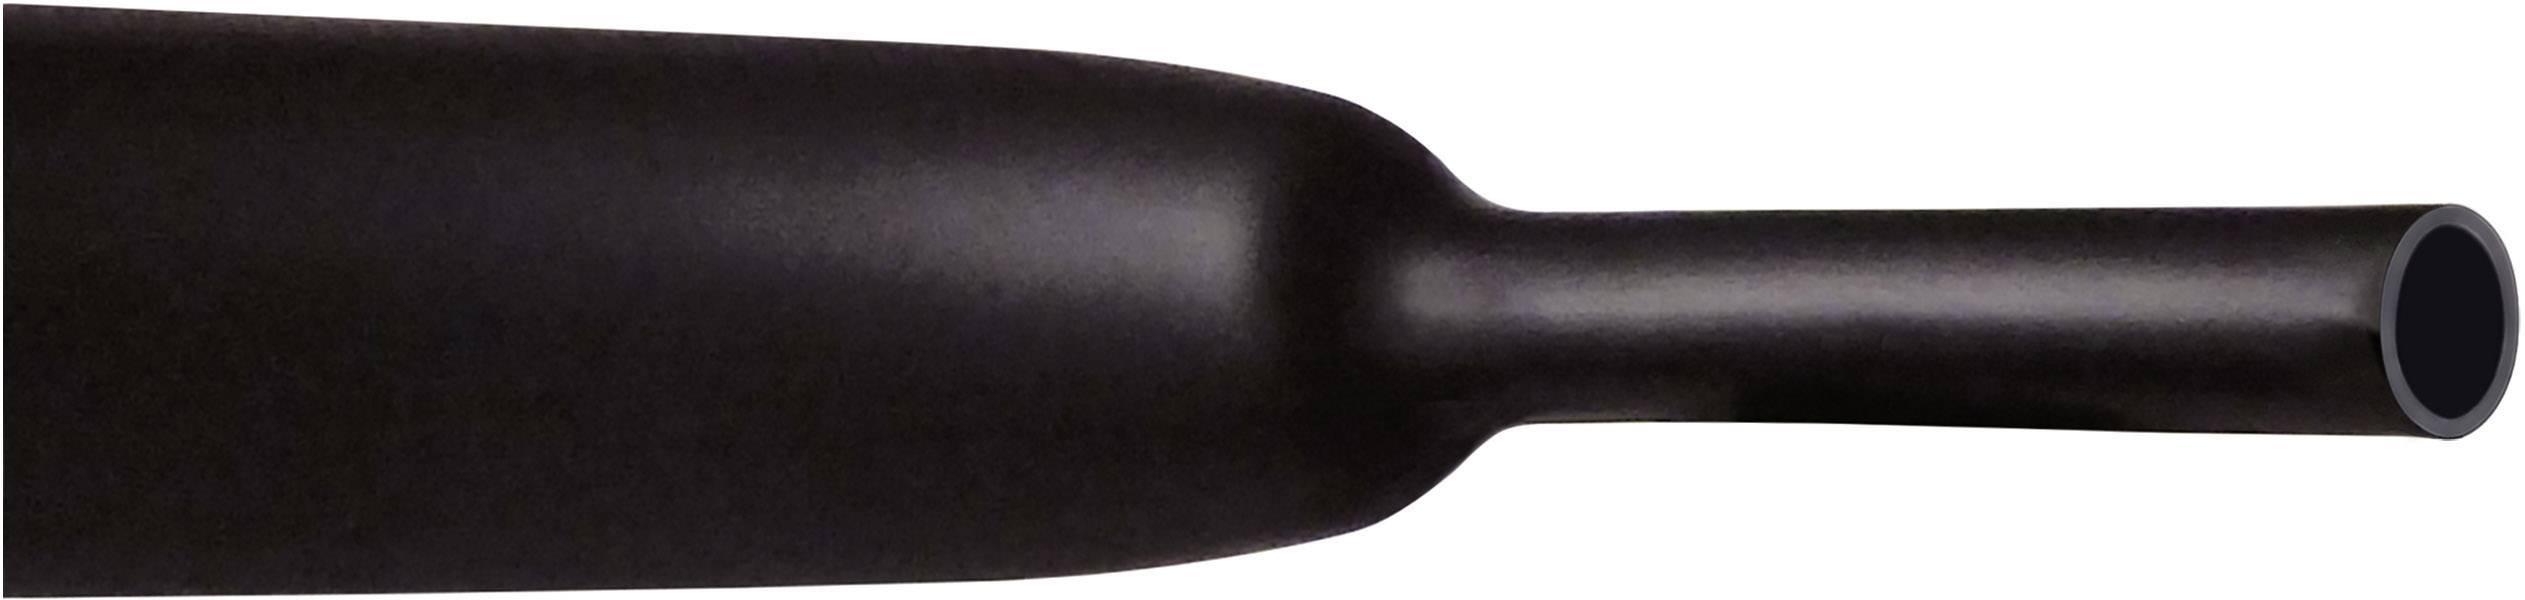 Schrumpfrate transparent Schrumpfschlauch 3,2mm 2m